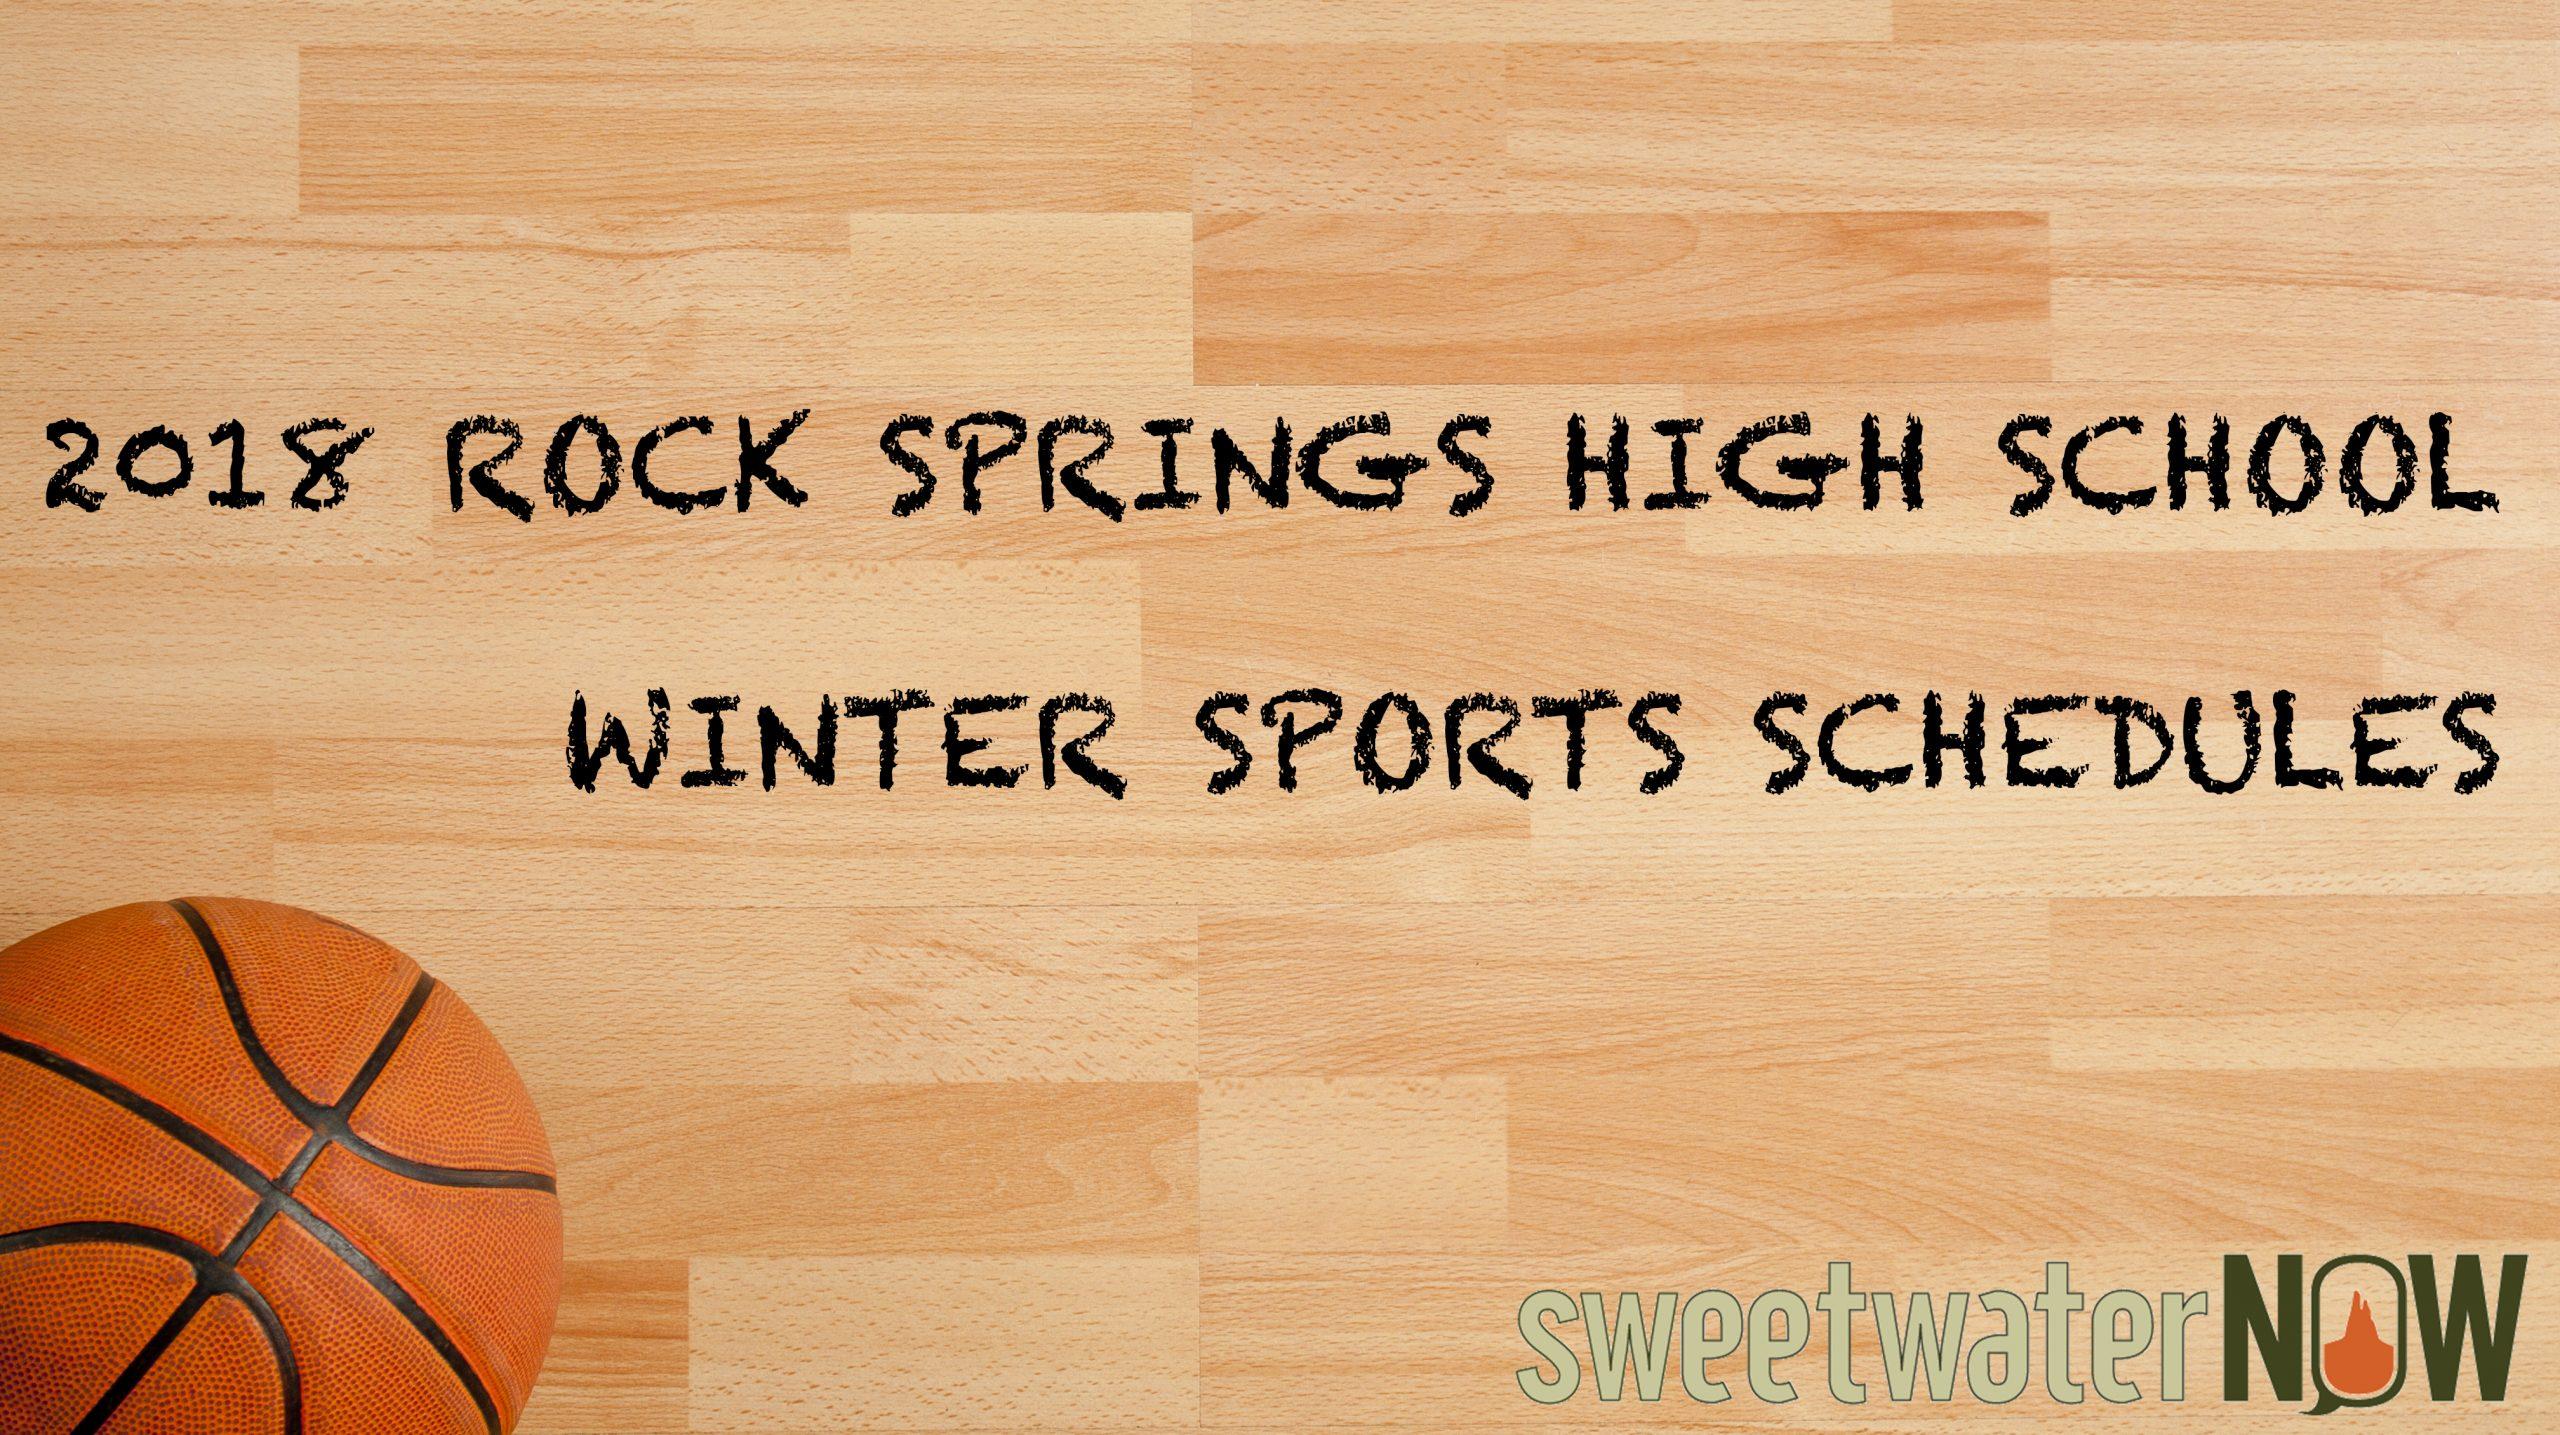 2018 Rock Springs High School Winter Sports Schedules